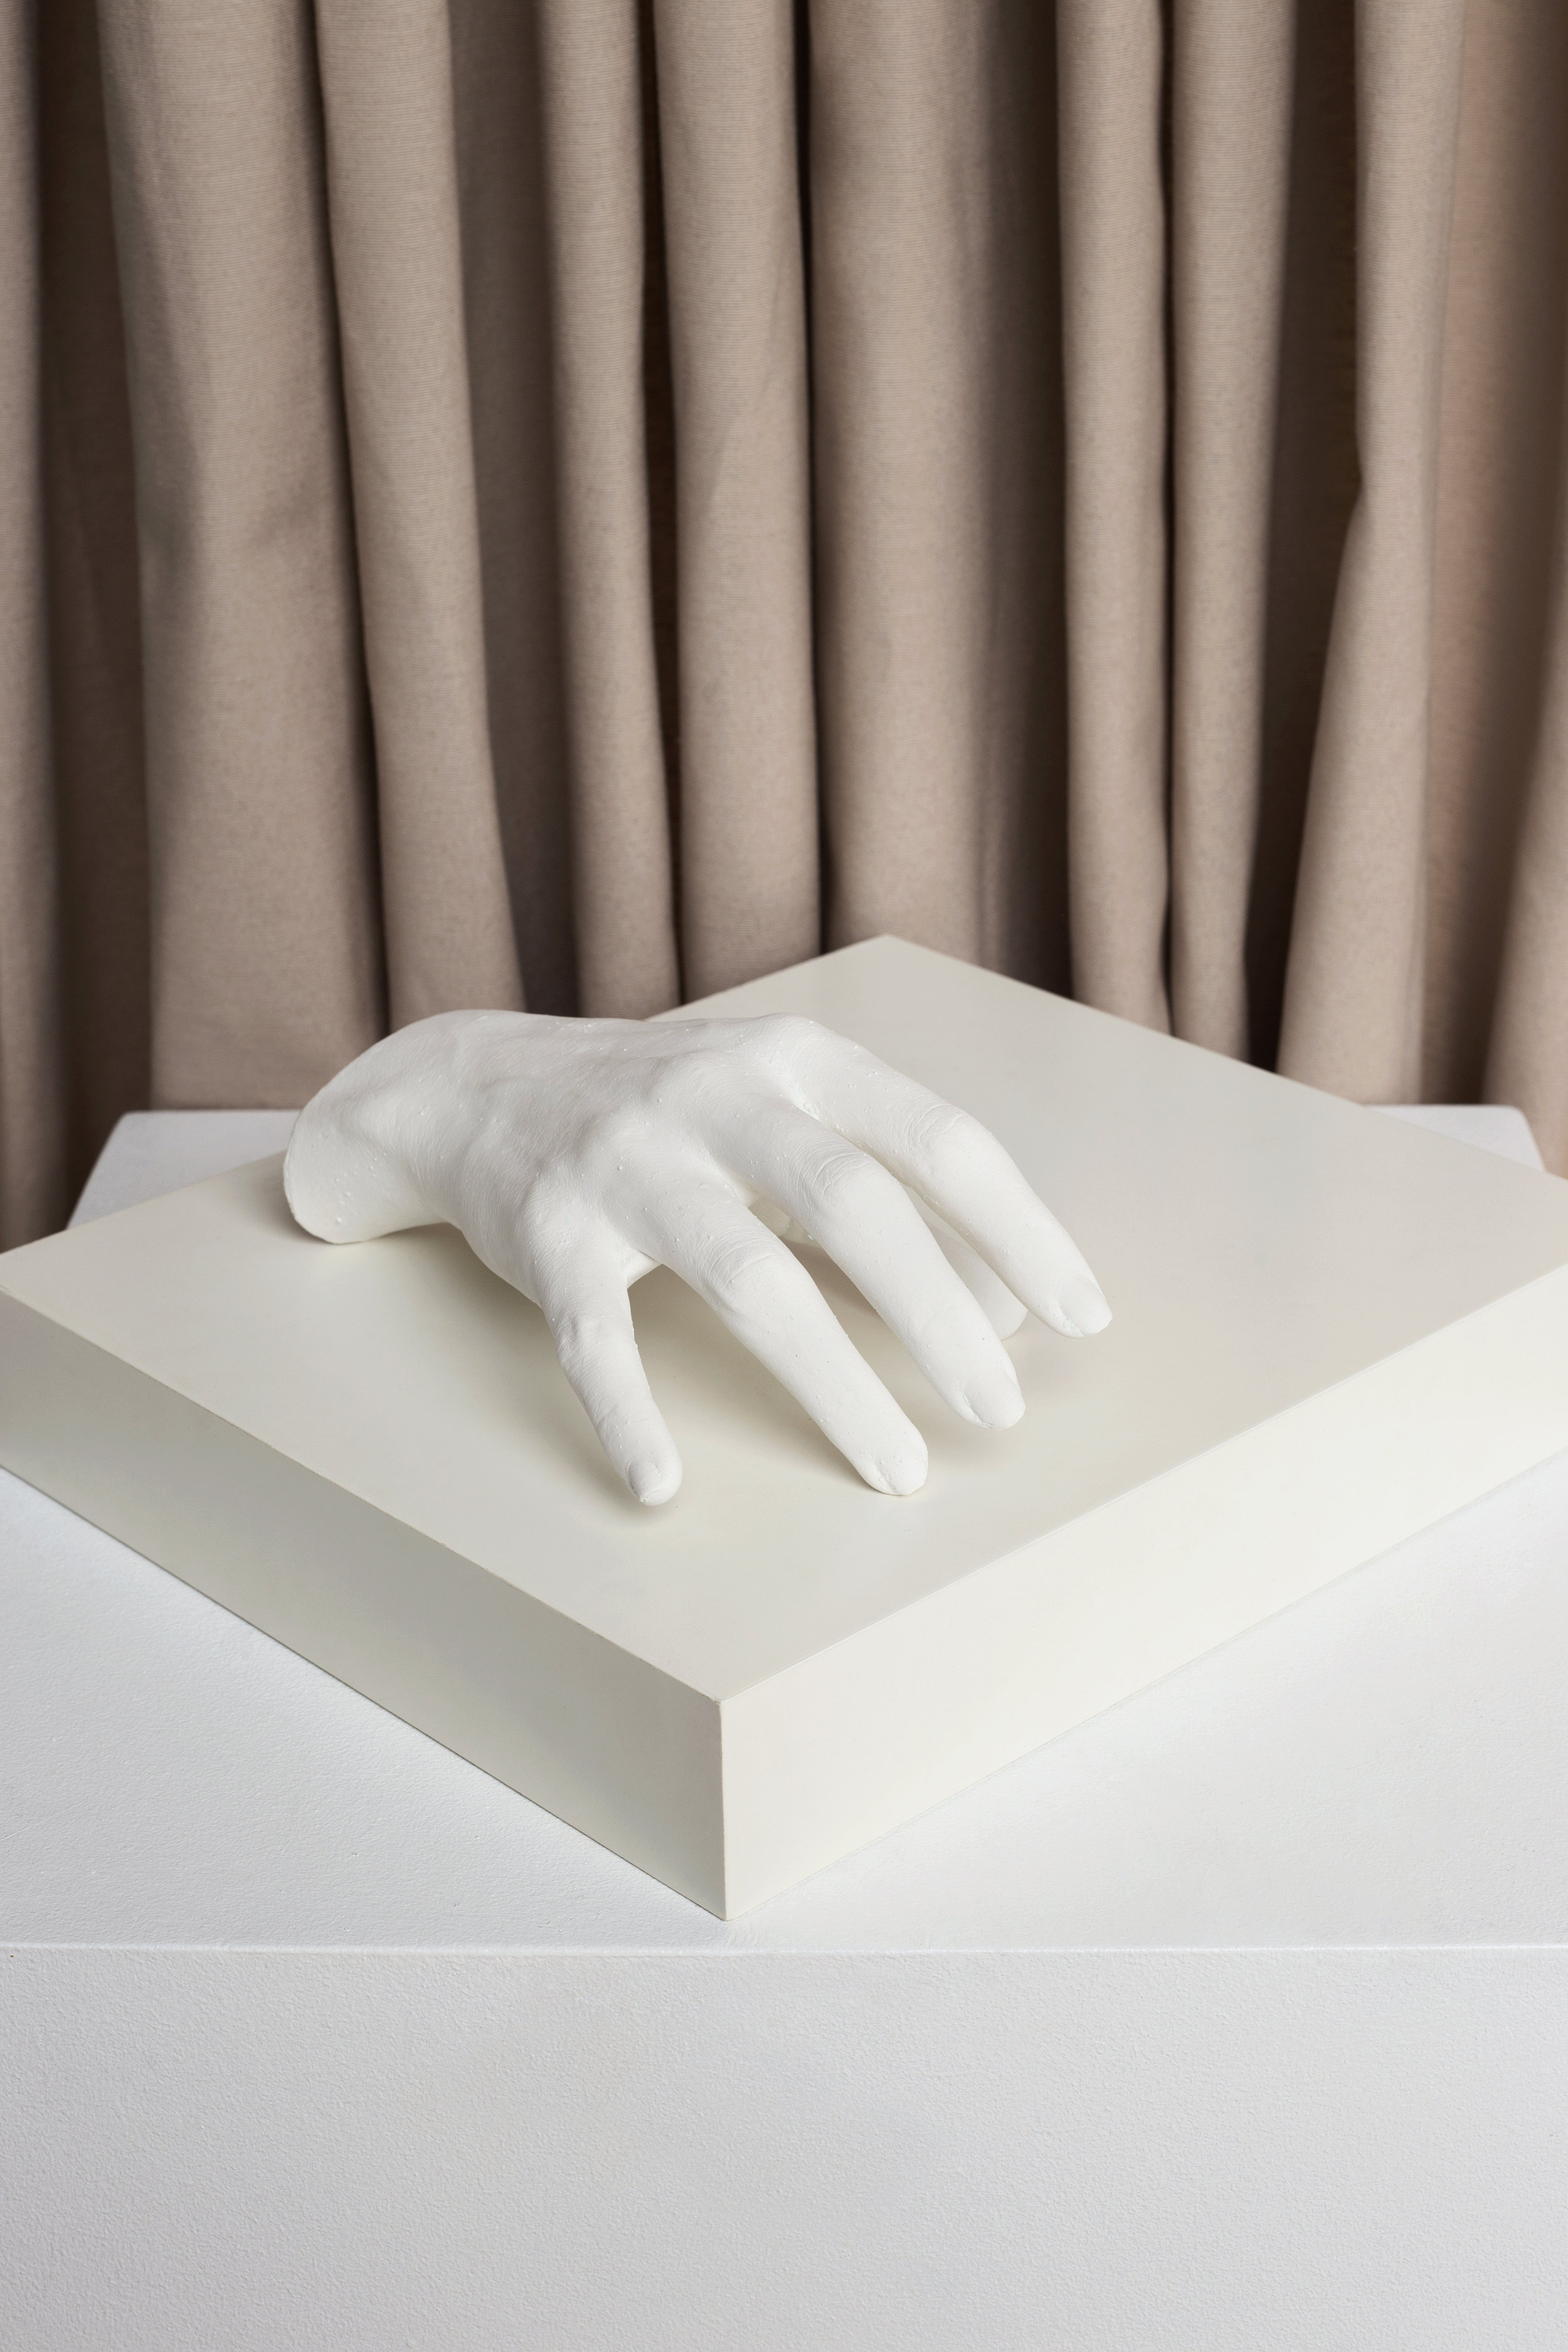 Plaster Hand  Set: La Cueva Studio & Marcela Luna  Photo: Erika Anes